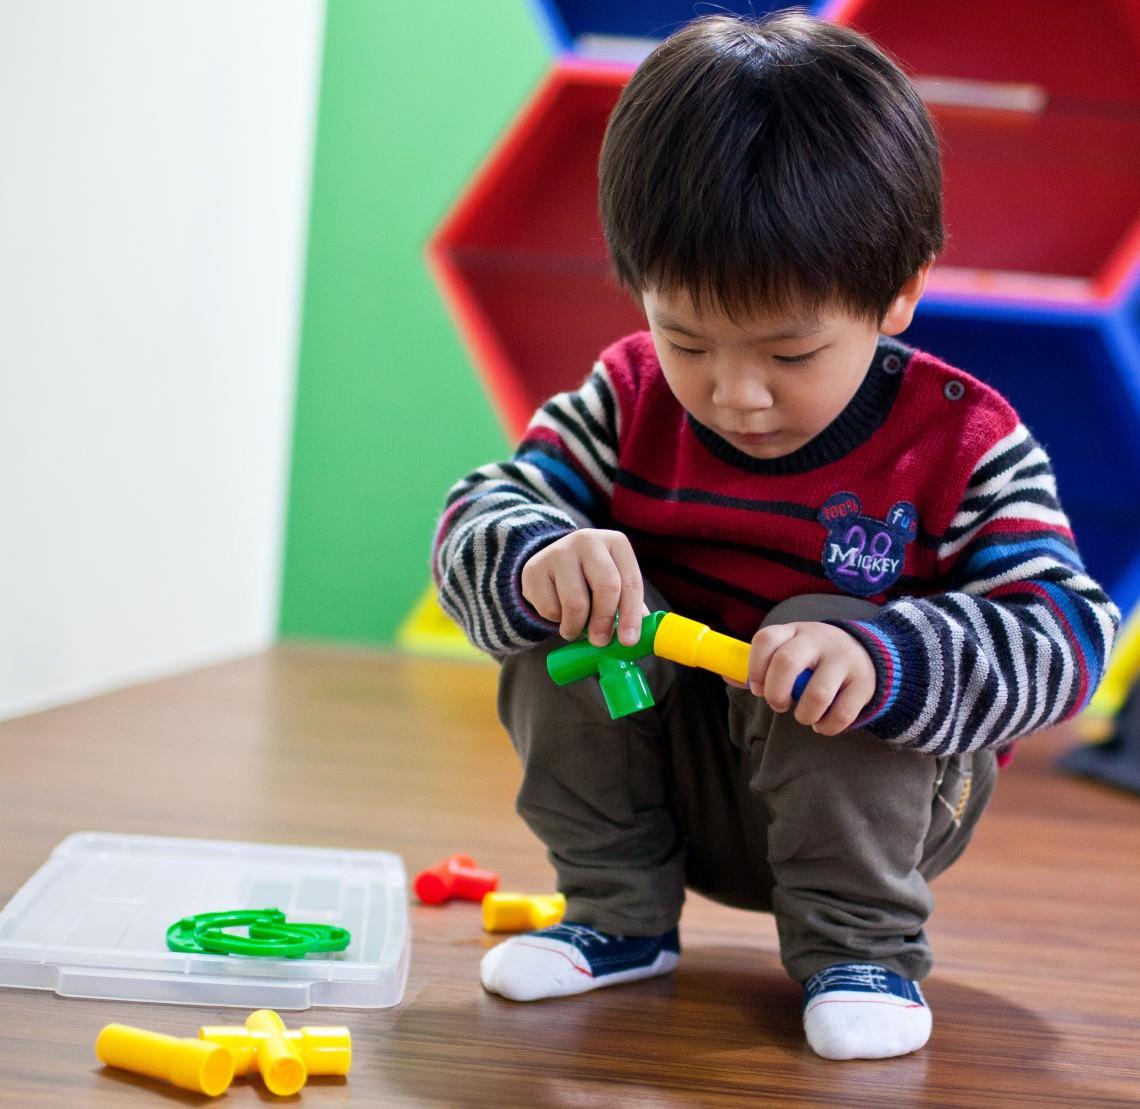 Baby toddler fine motor skills development milestones for Motor skills child development